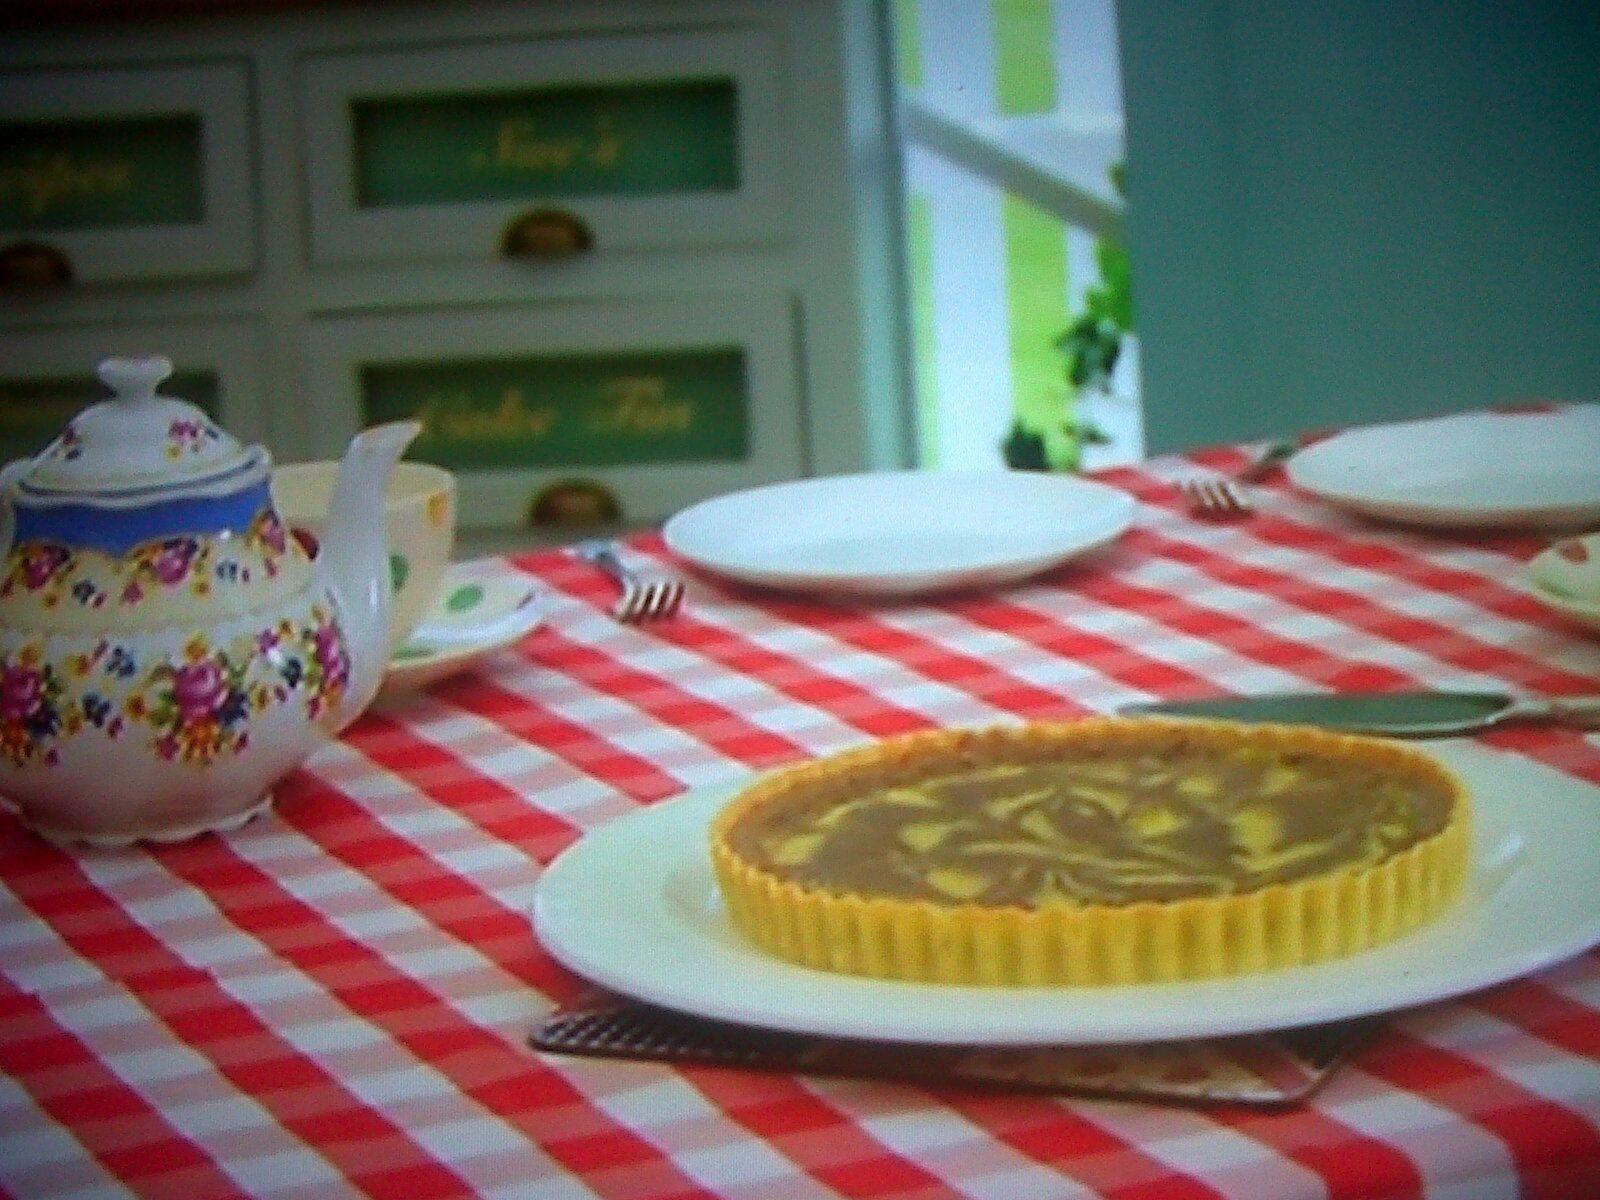 Mary's Chocolate Orange Tart Featured On The Great British Bake Off Masterclass